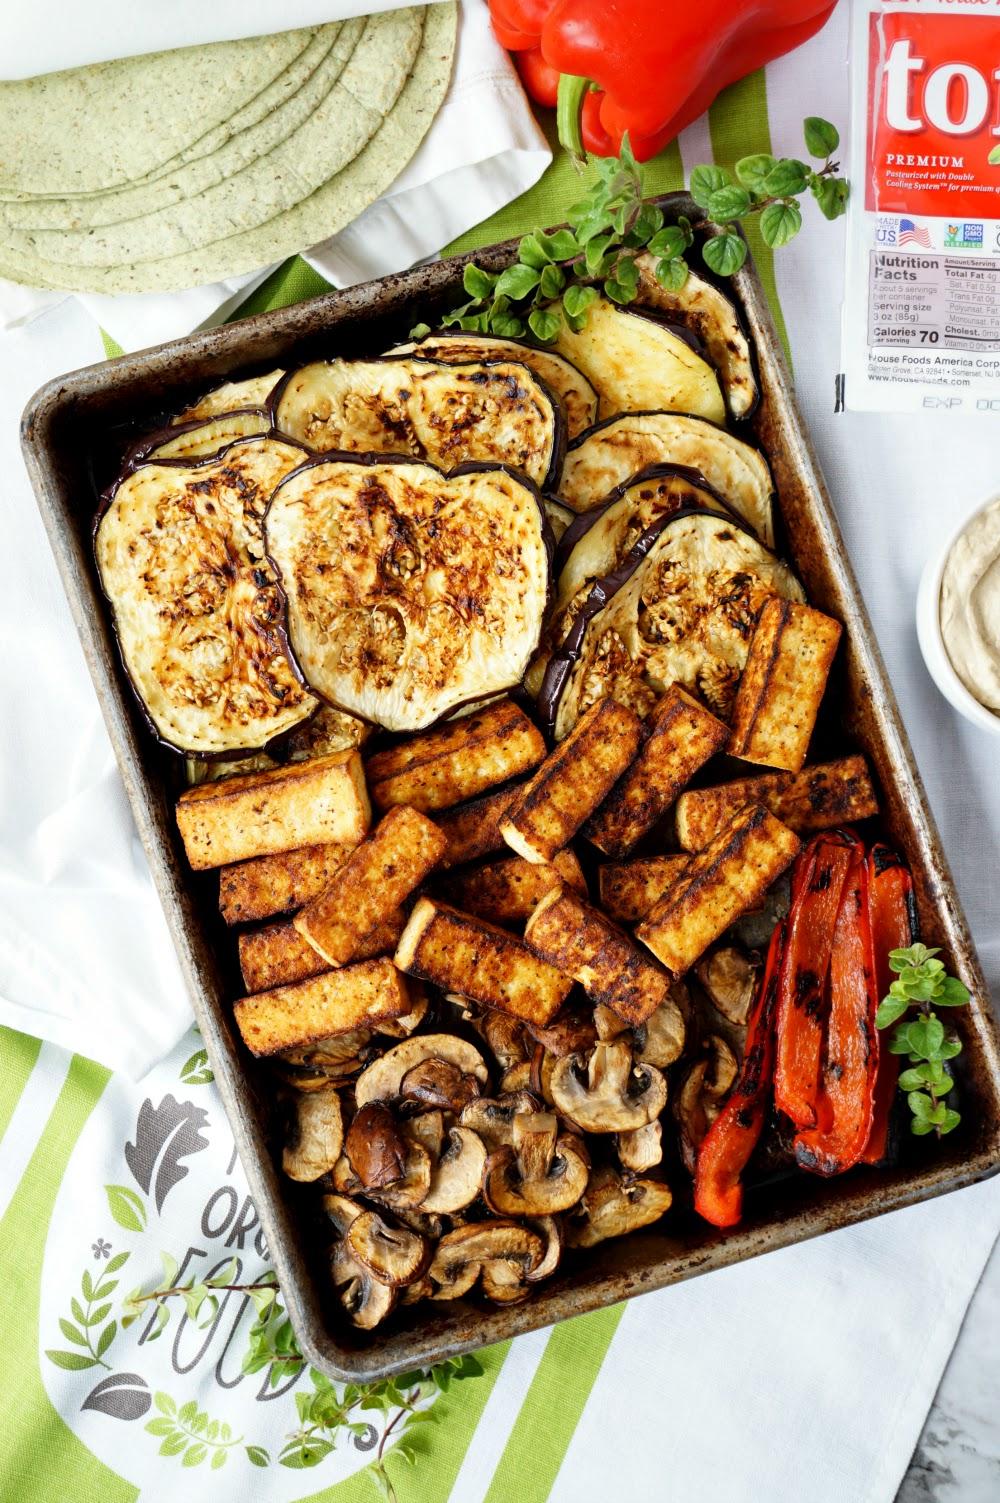 vegan grilled veggie & tofu wraps with hummus   The Baking Fairy